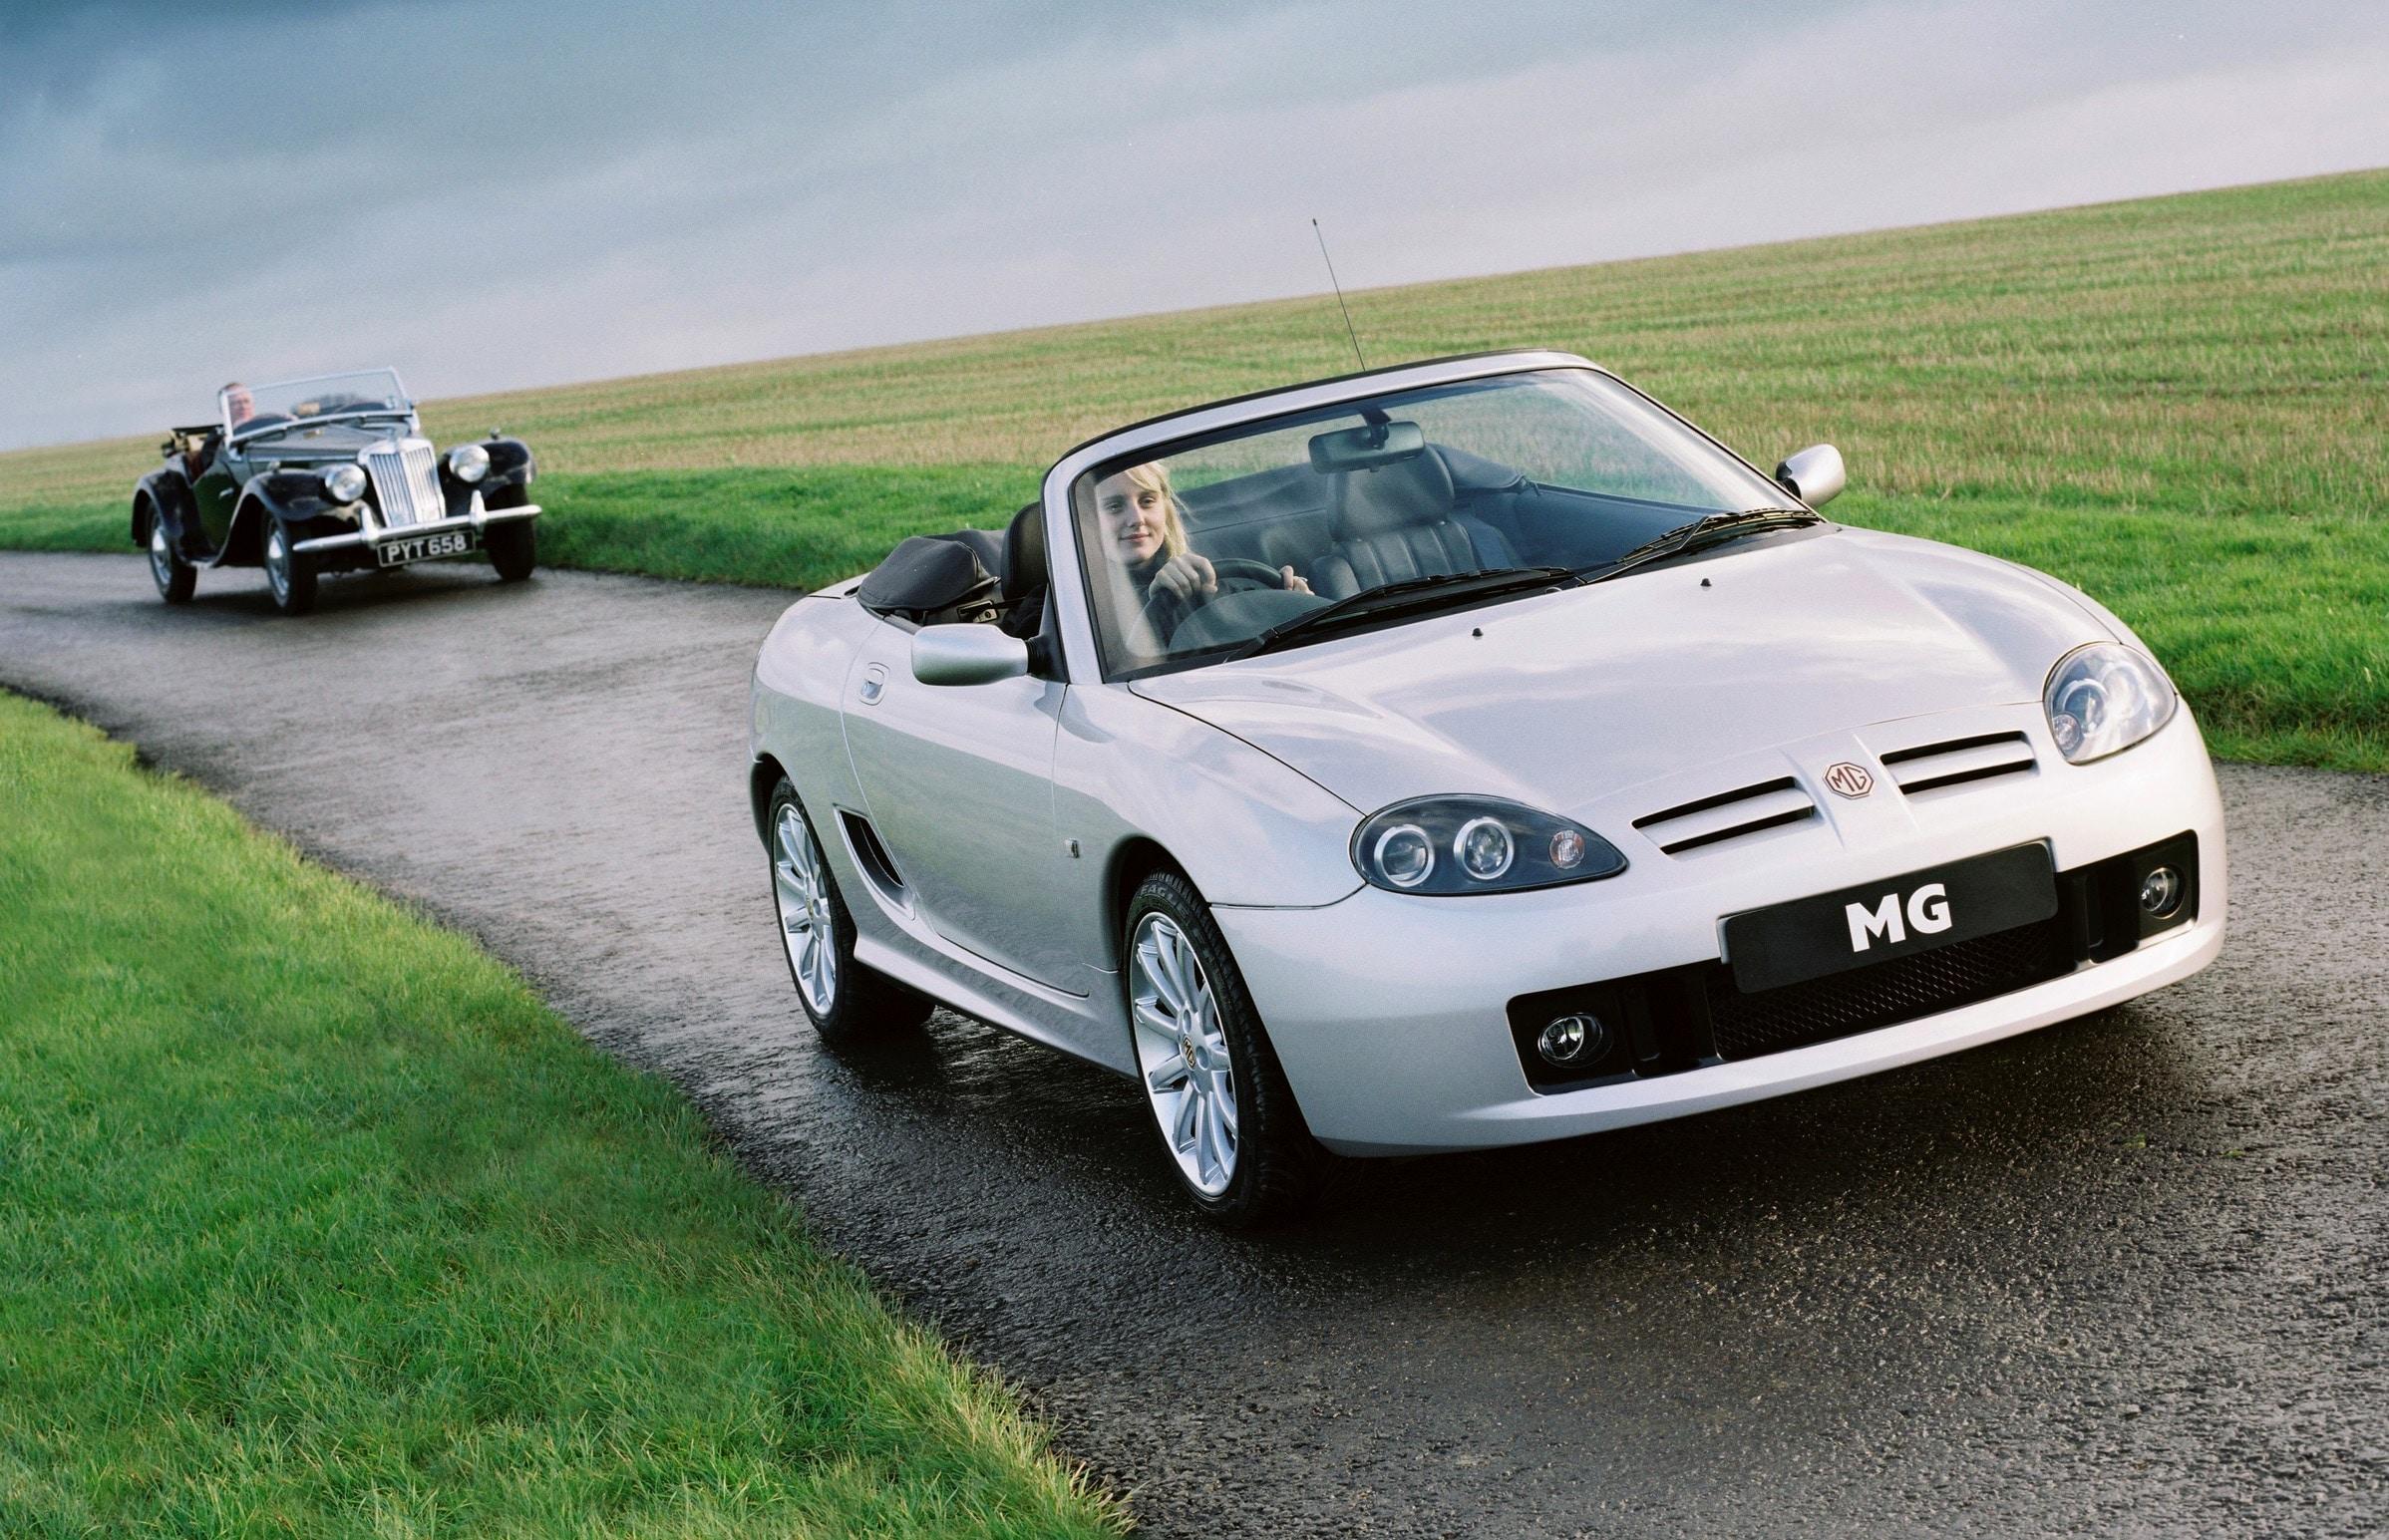 MG TF, MG, TF, MGF, sports car, sportscar, mid-engine, K series, British car, classic car, retro car, old car, convertible, car club, rear-wheel drive, Longbridge, Rover, car, cars, ebay, ebay motors, autotrader